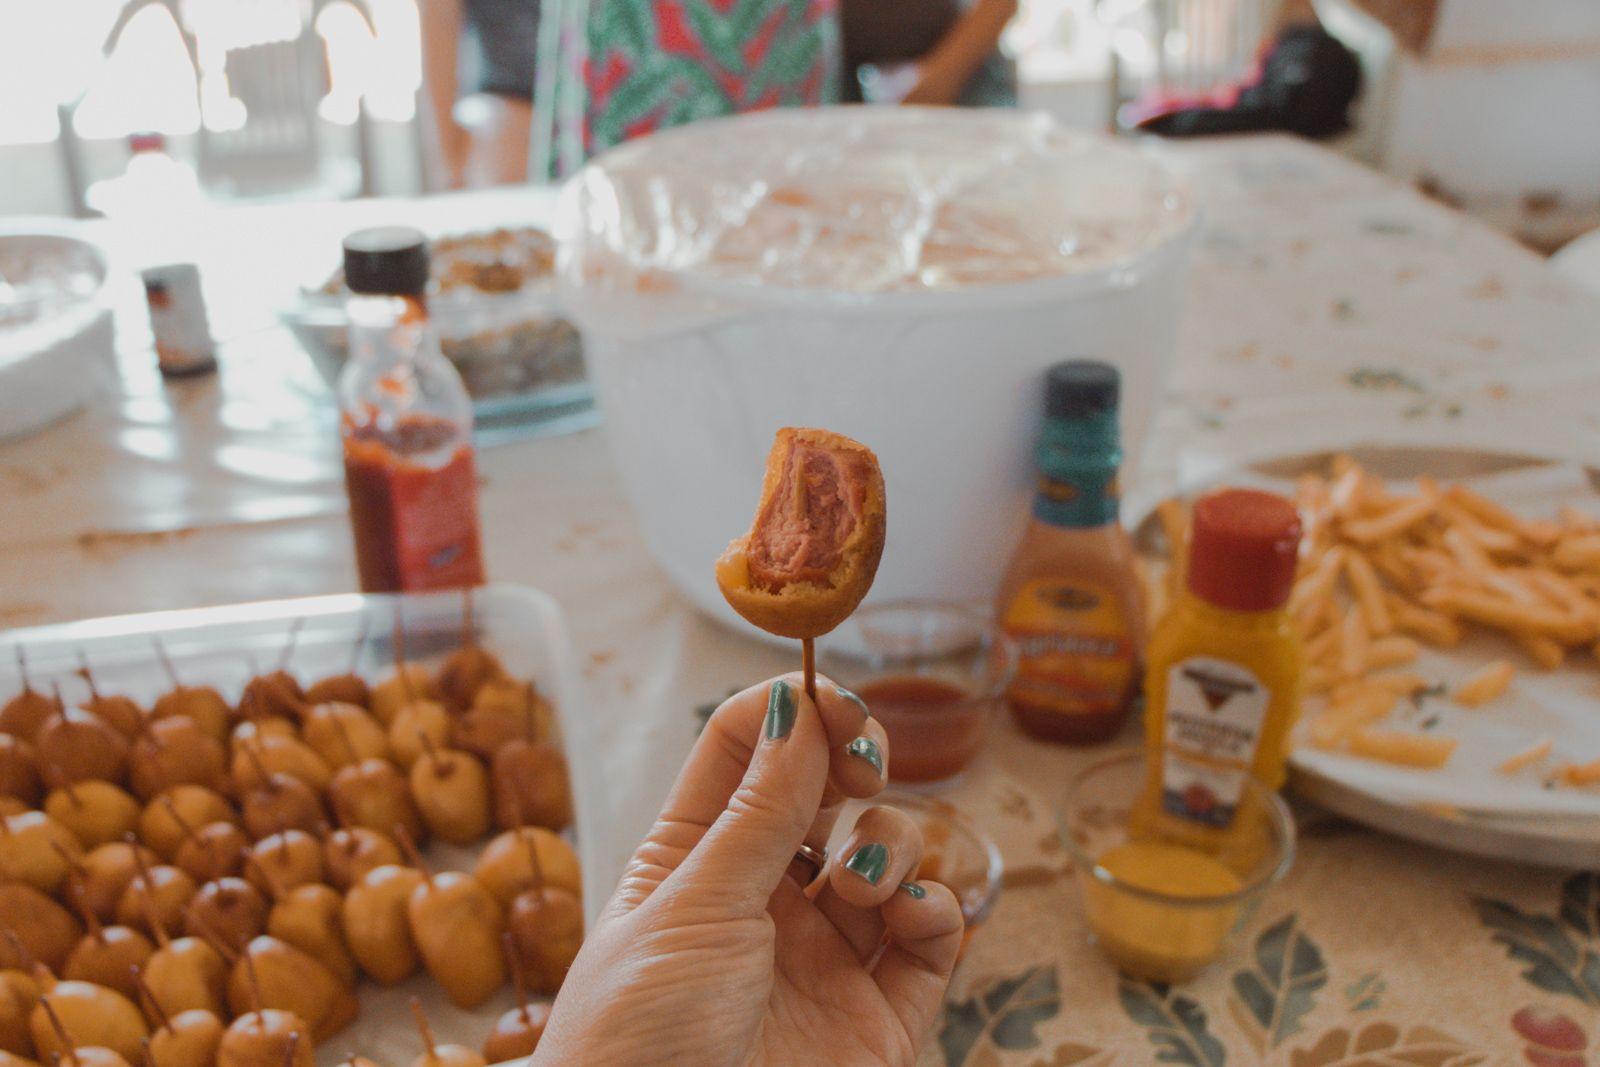 Aniversário com Paella e provando mini Corn Dogs